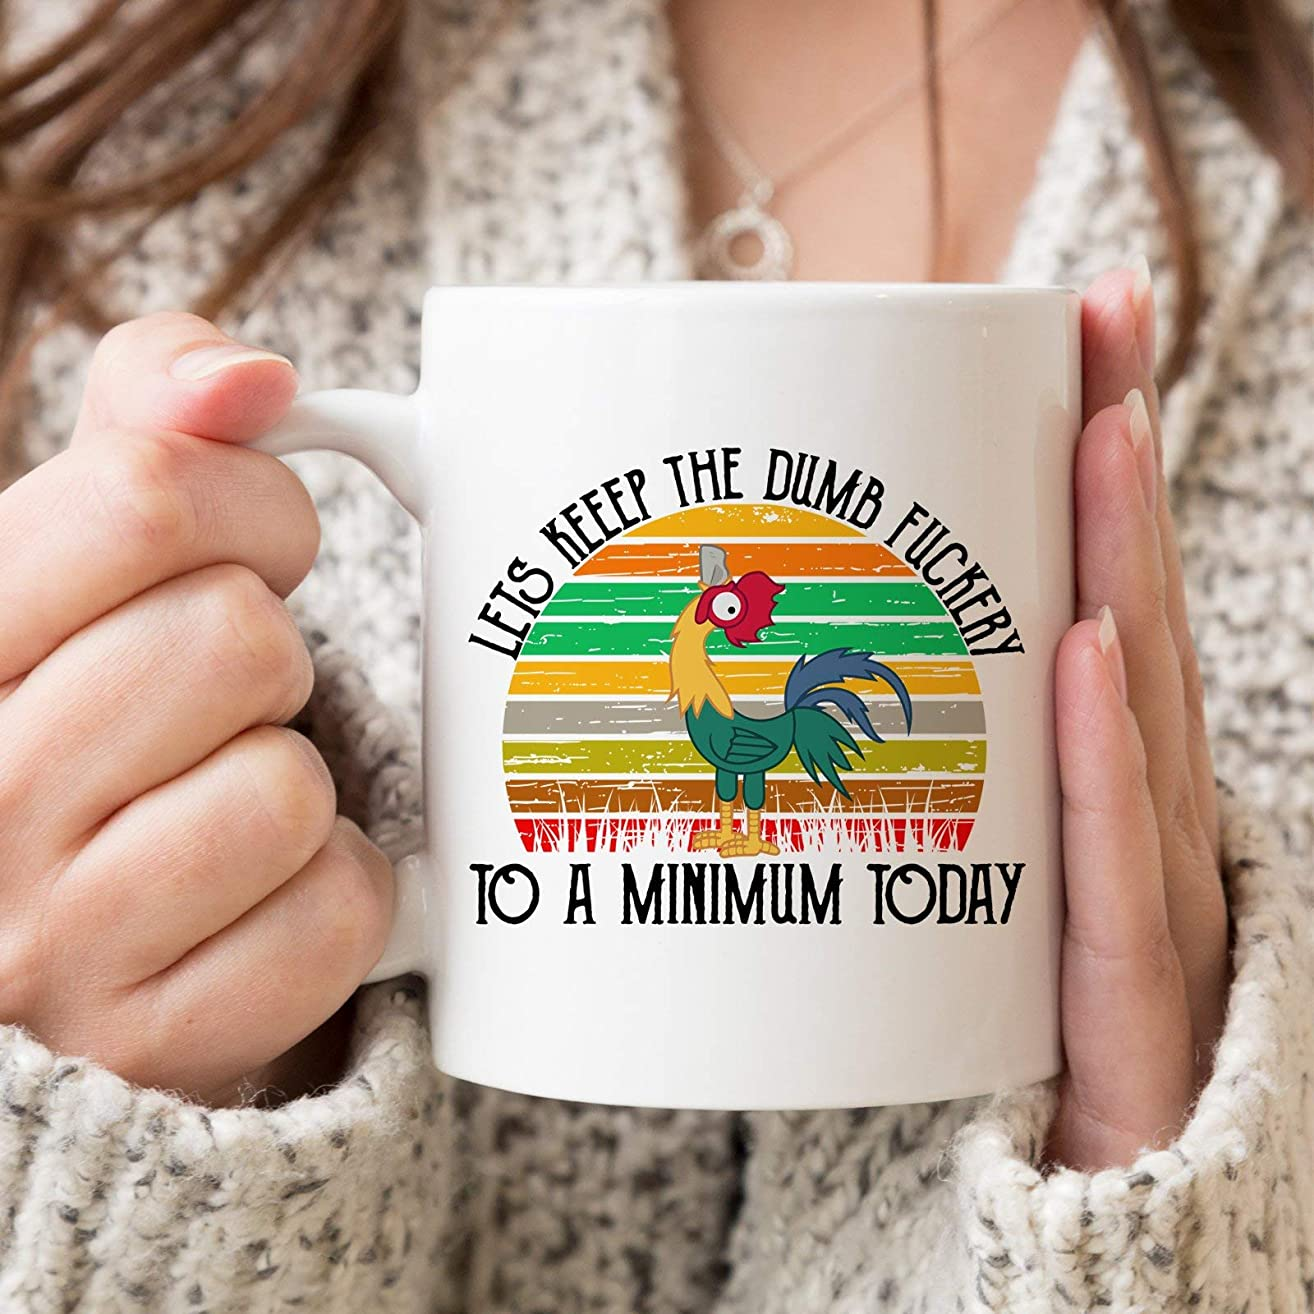 Let's Keep The Dumbfuckery To A Minimum Today, Dumbfuck, Fuck Mug- Coffee Mug, Tea Mug, Cute Mug - Gift, cute gift, Souvenir, 11oz, 15oz